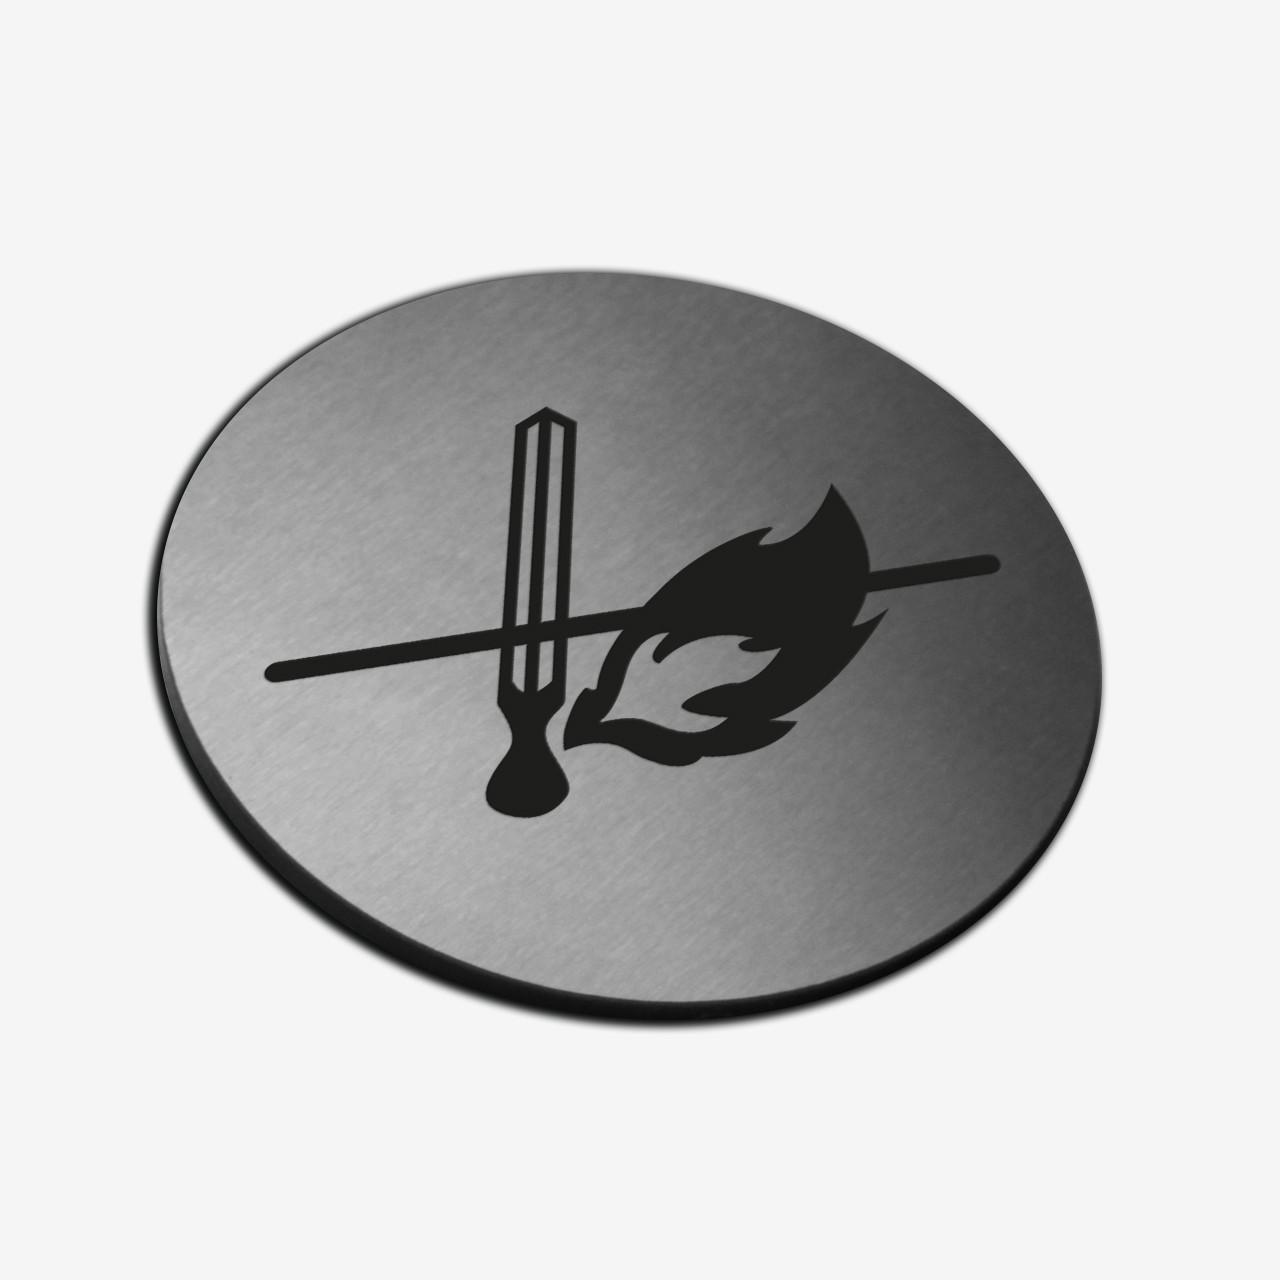 "Табличка круглая ""Огонь запрещен"" Stainless Steel"